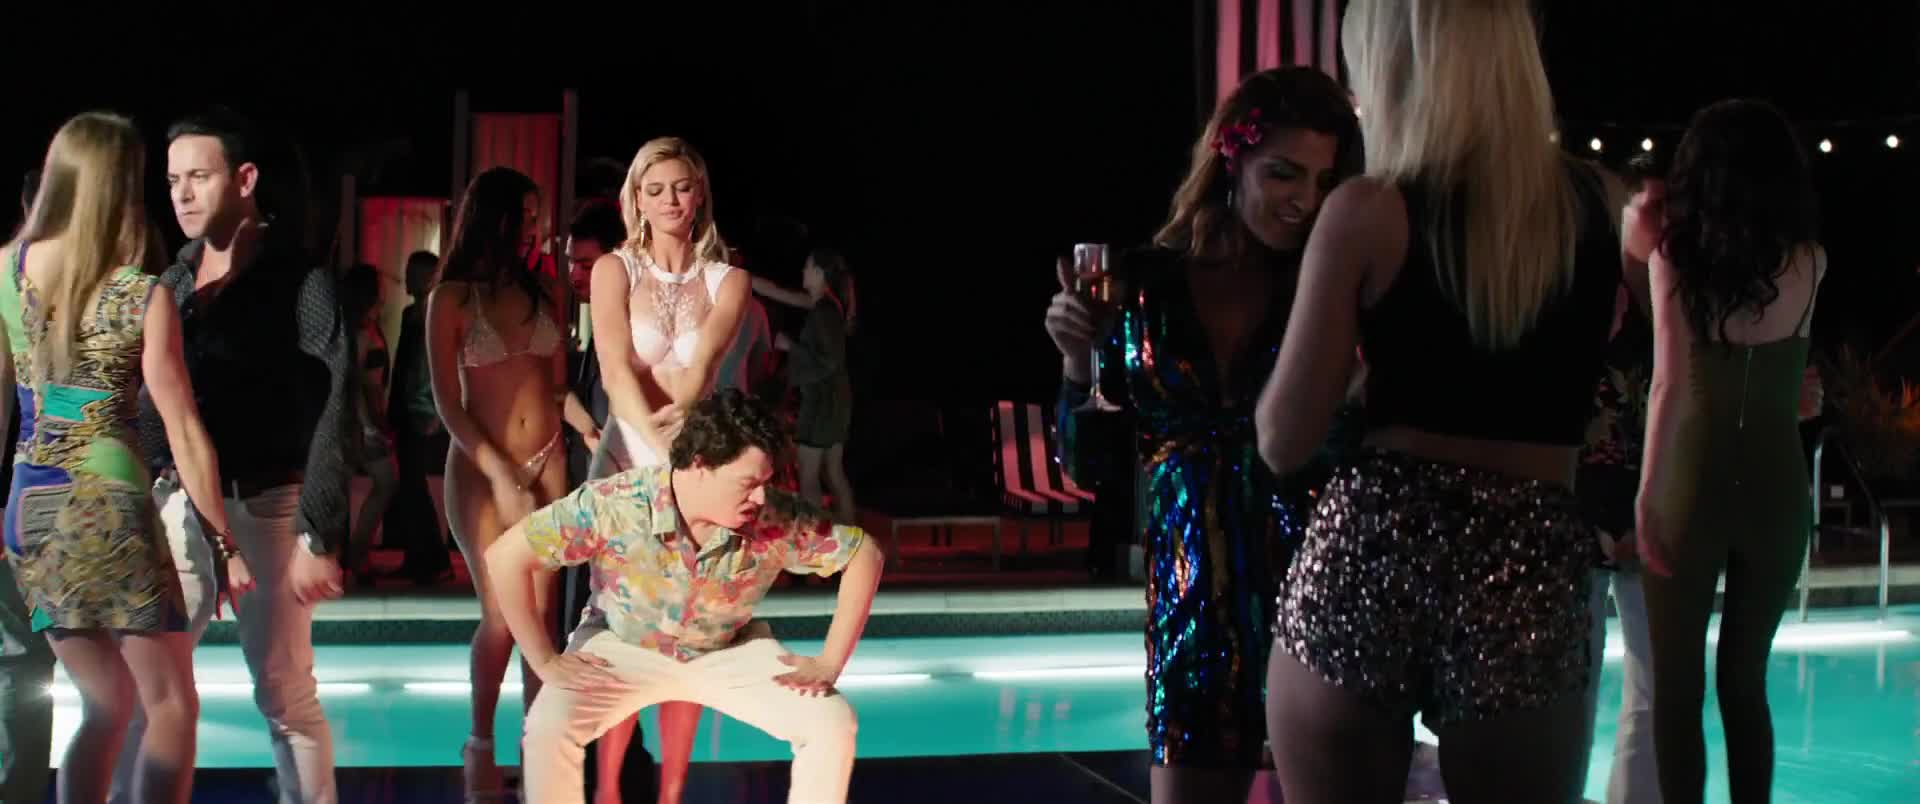 Kelly Rohrbach screentime in baywatch 2017